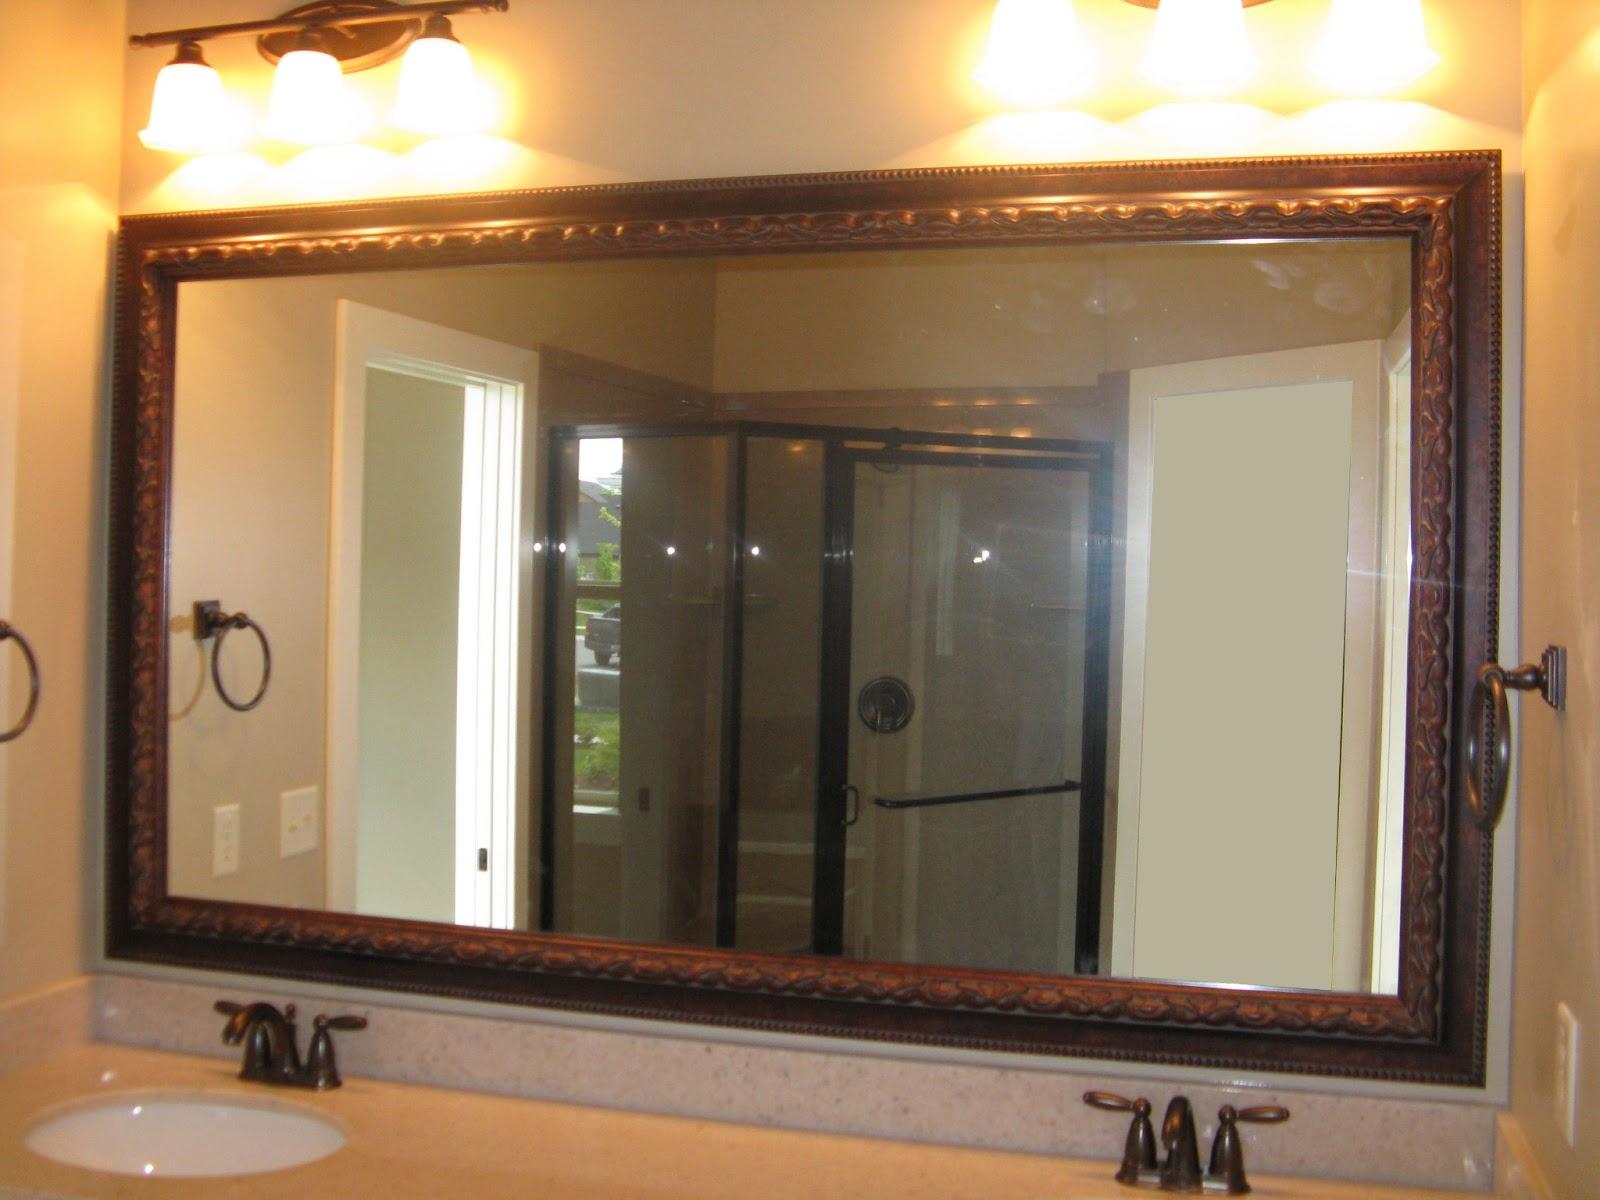 Bathroom Mirror Trim Kitreflected design same mirror frame kit 4 different looks